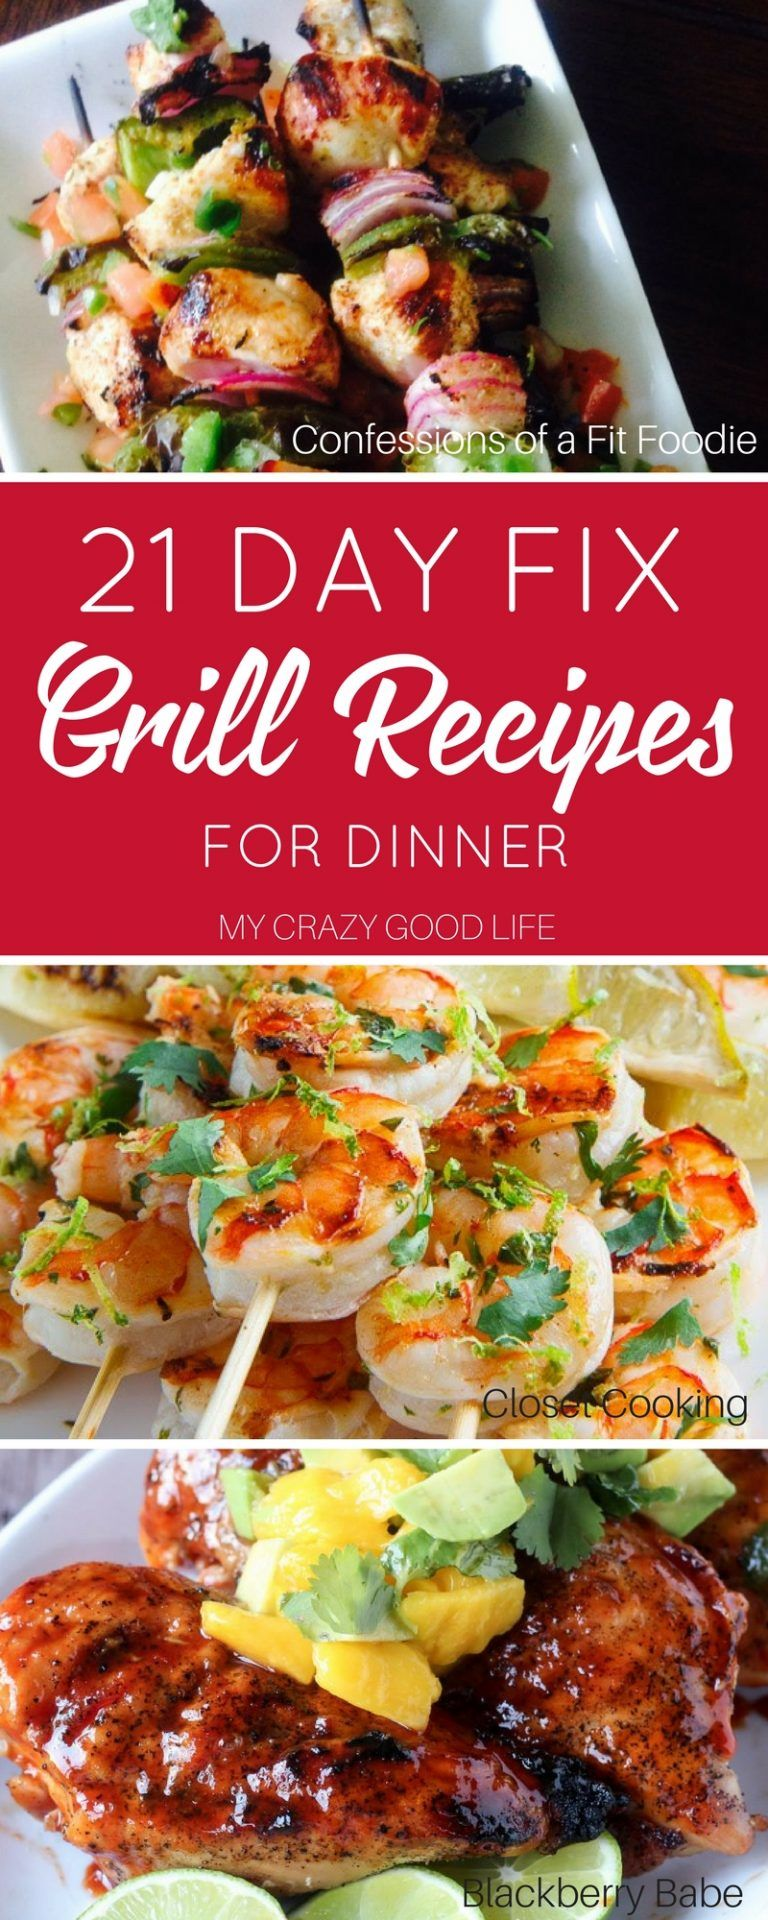 21 Day Fix Grill Recipes